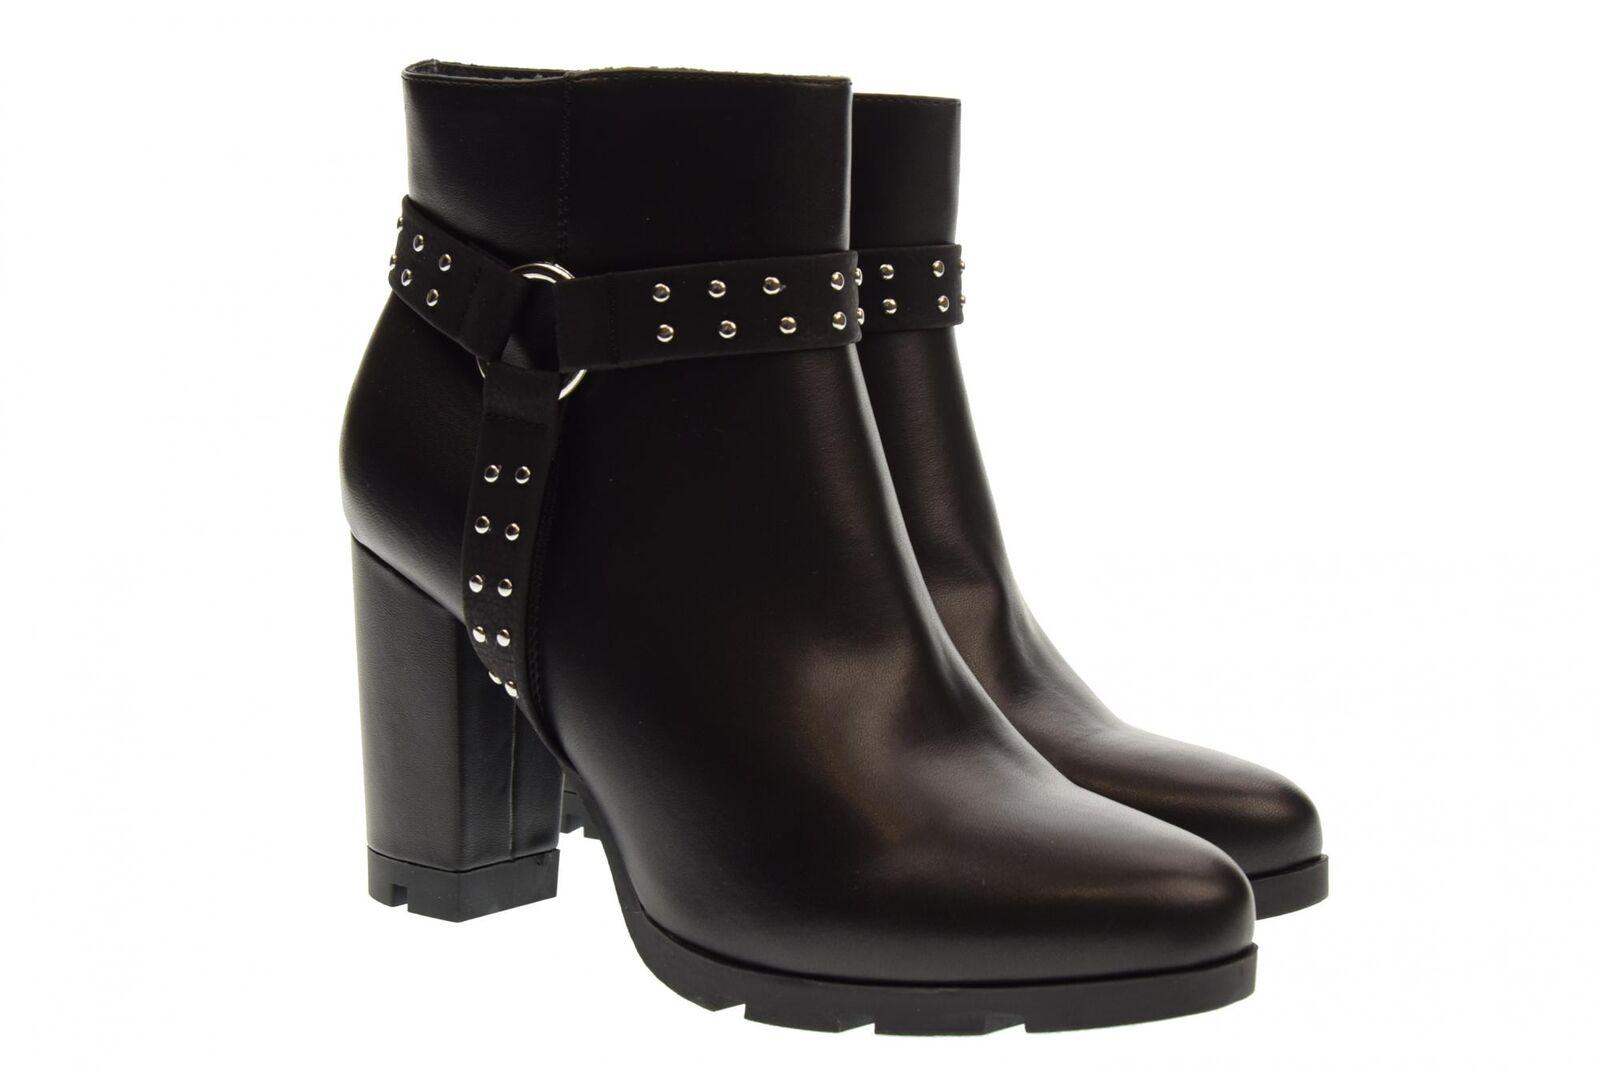 Mariamare A18u chaussures Femme Bottines 62216 C35275 Mily B